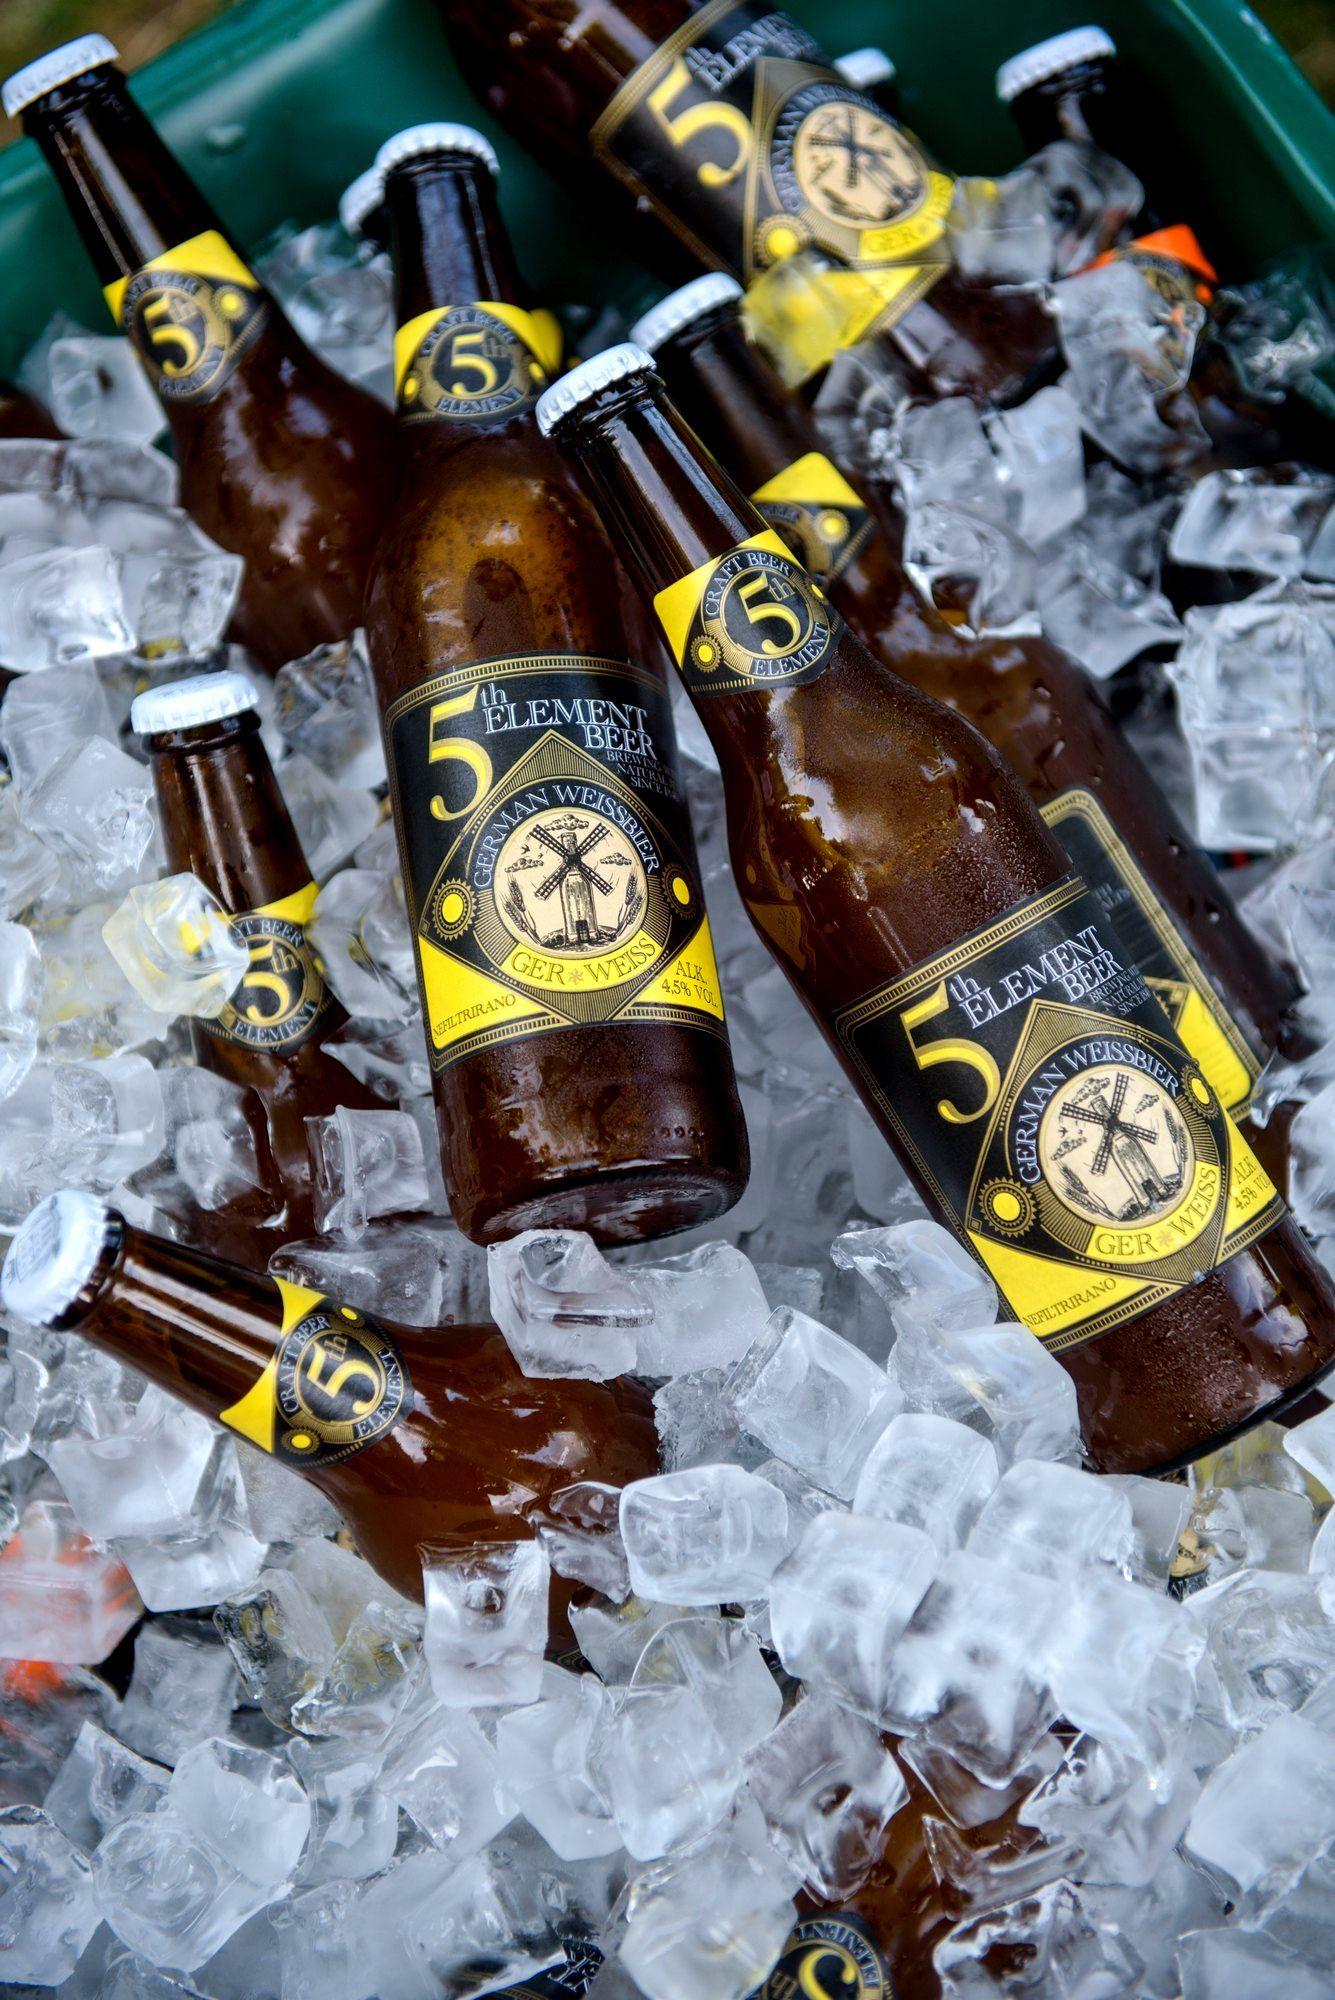 01_Gerweiss, novo ljetno pivo 5th Element u ledu